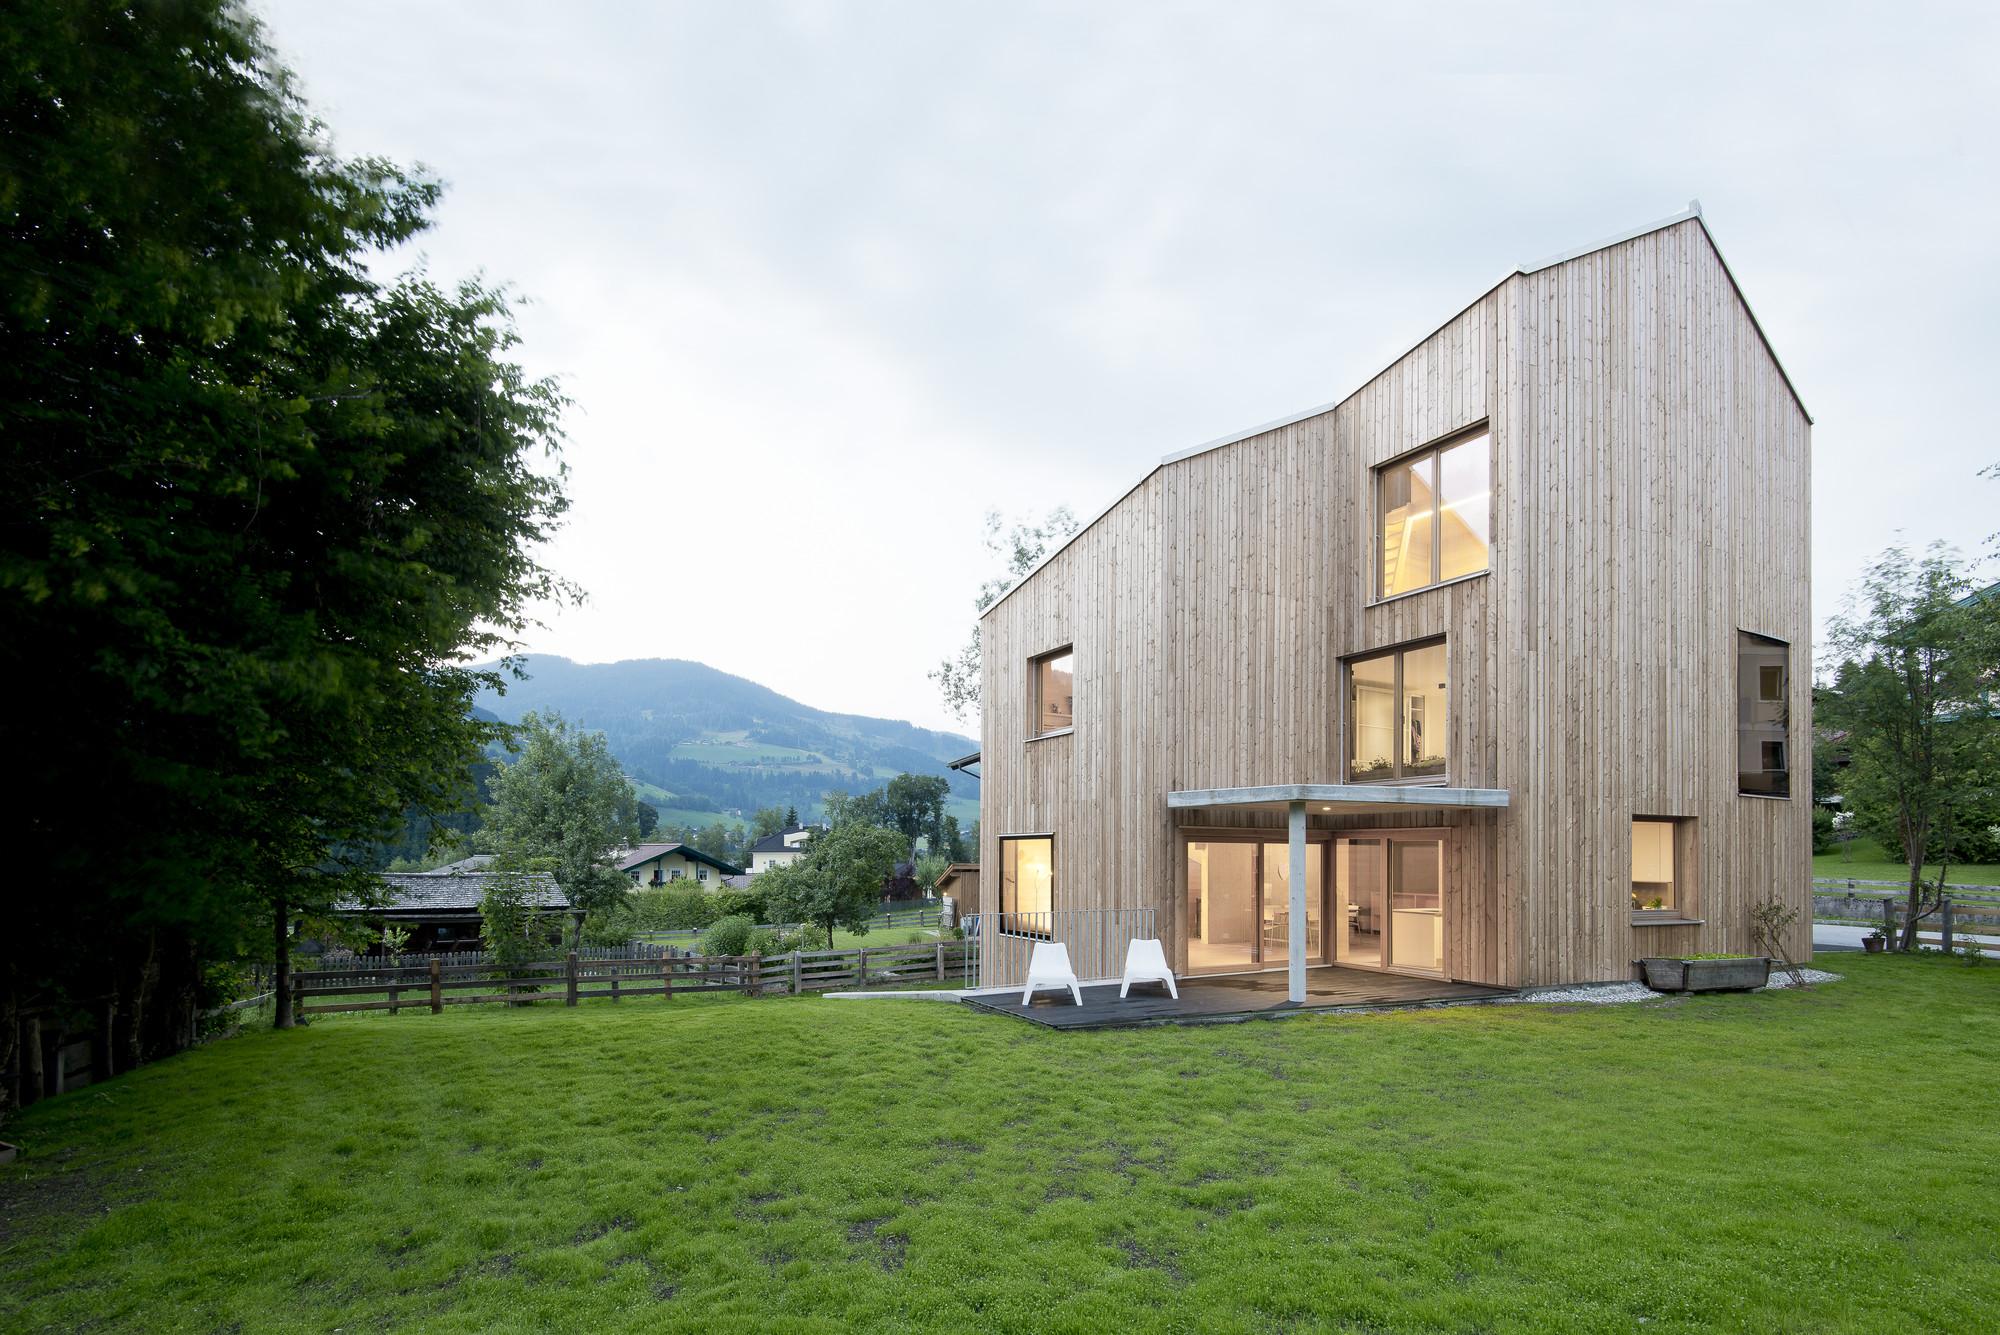 Emberger Residence / LP Architektur, © wortmeyer photography